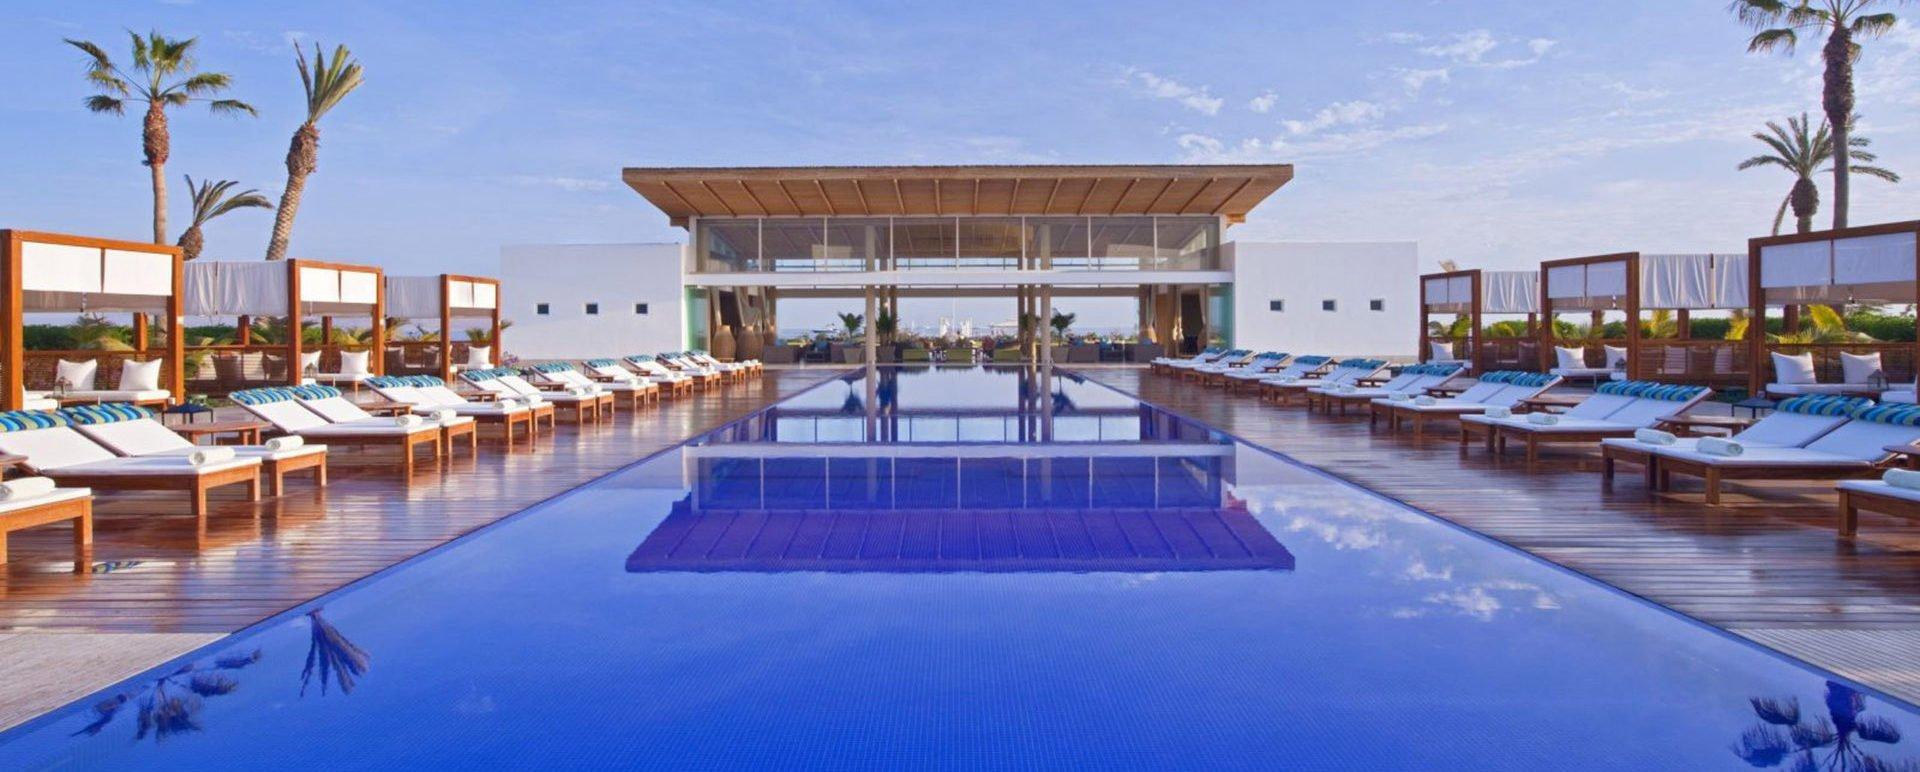 Libertador Paracas pool